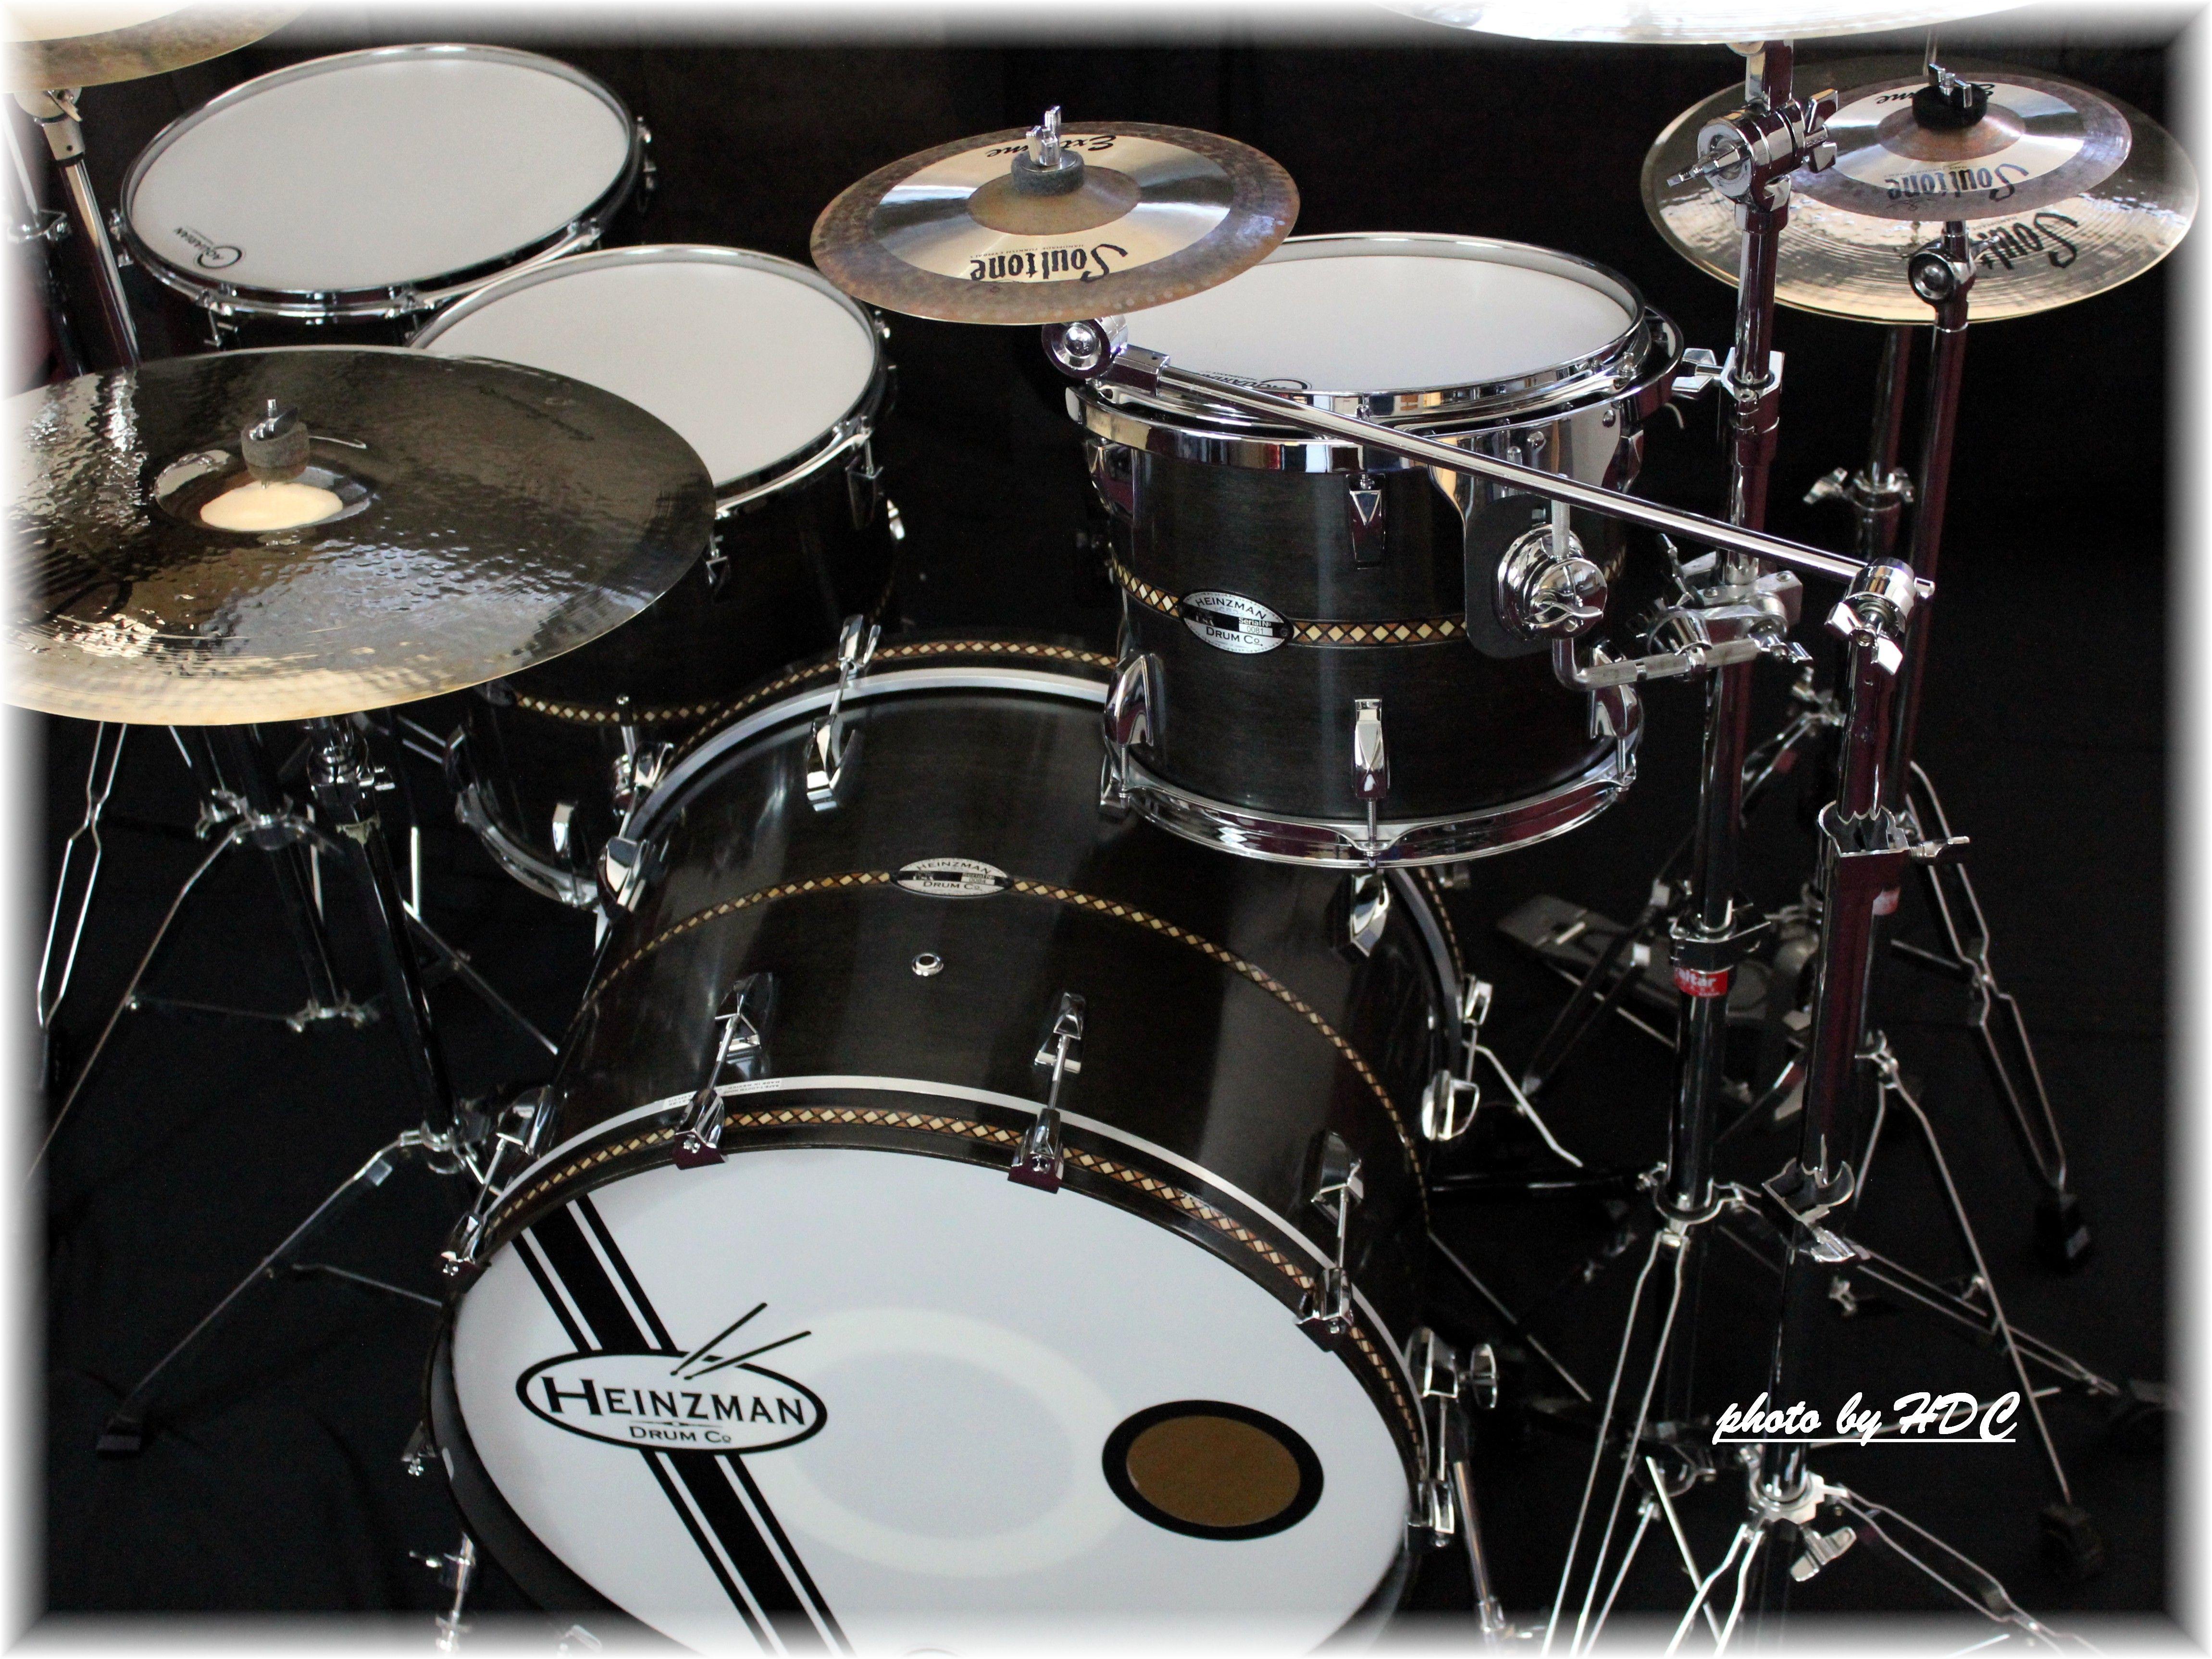 pin on heinzman drum company. Black Bedroom Furniture Sets. Home Design Ideas